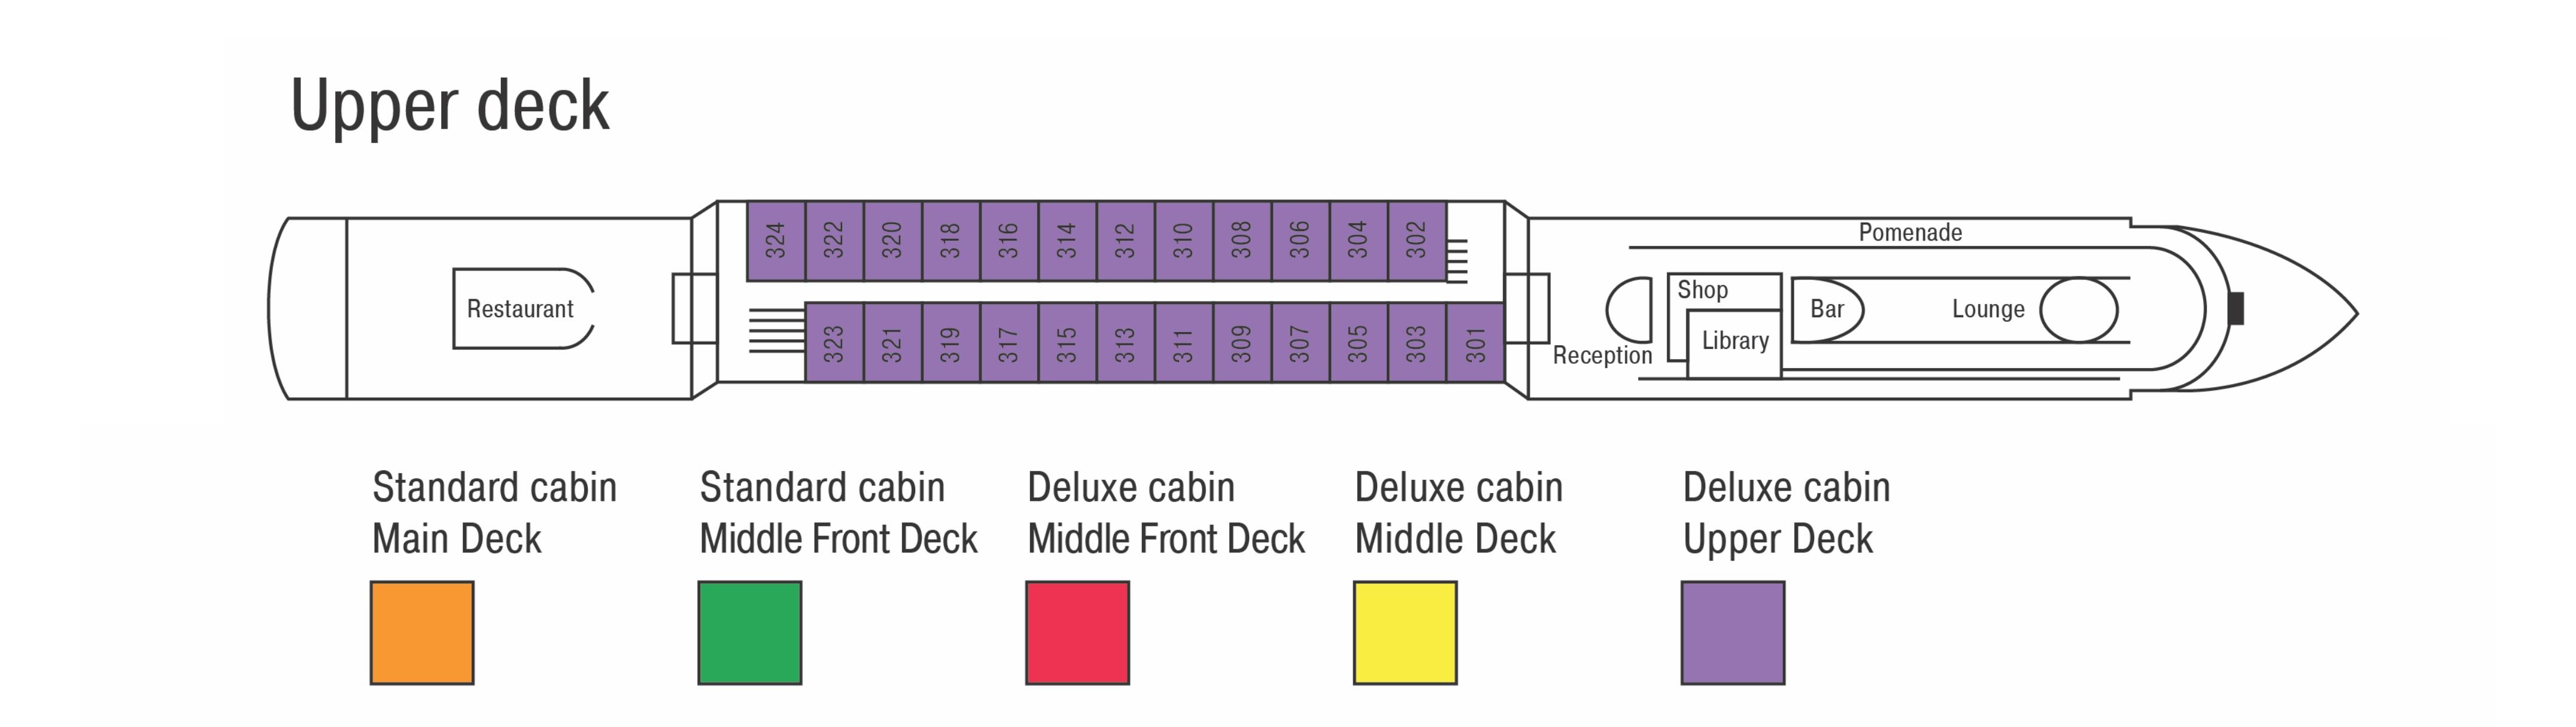 MS Crucestar, Upper Deck